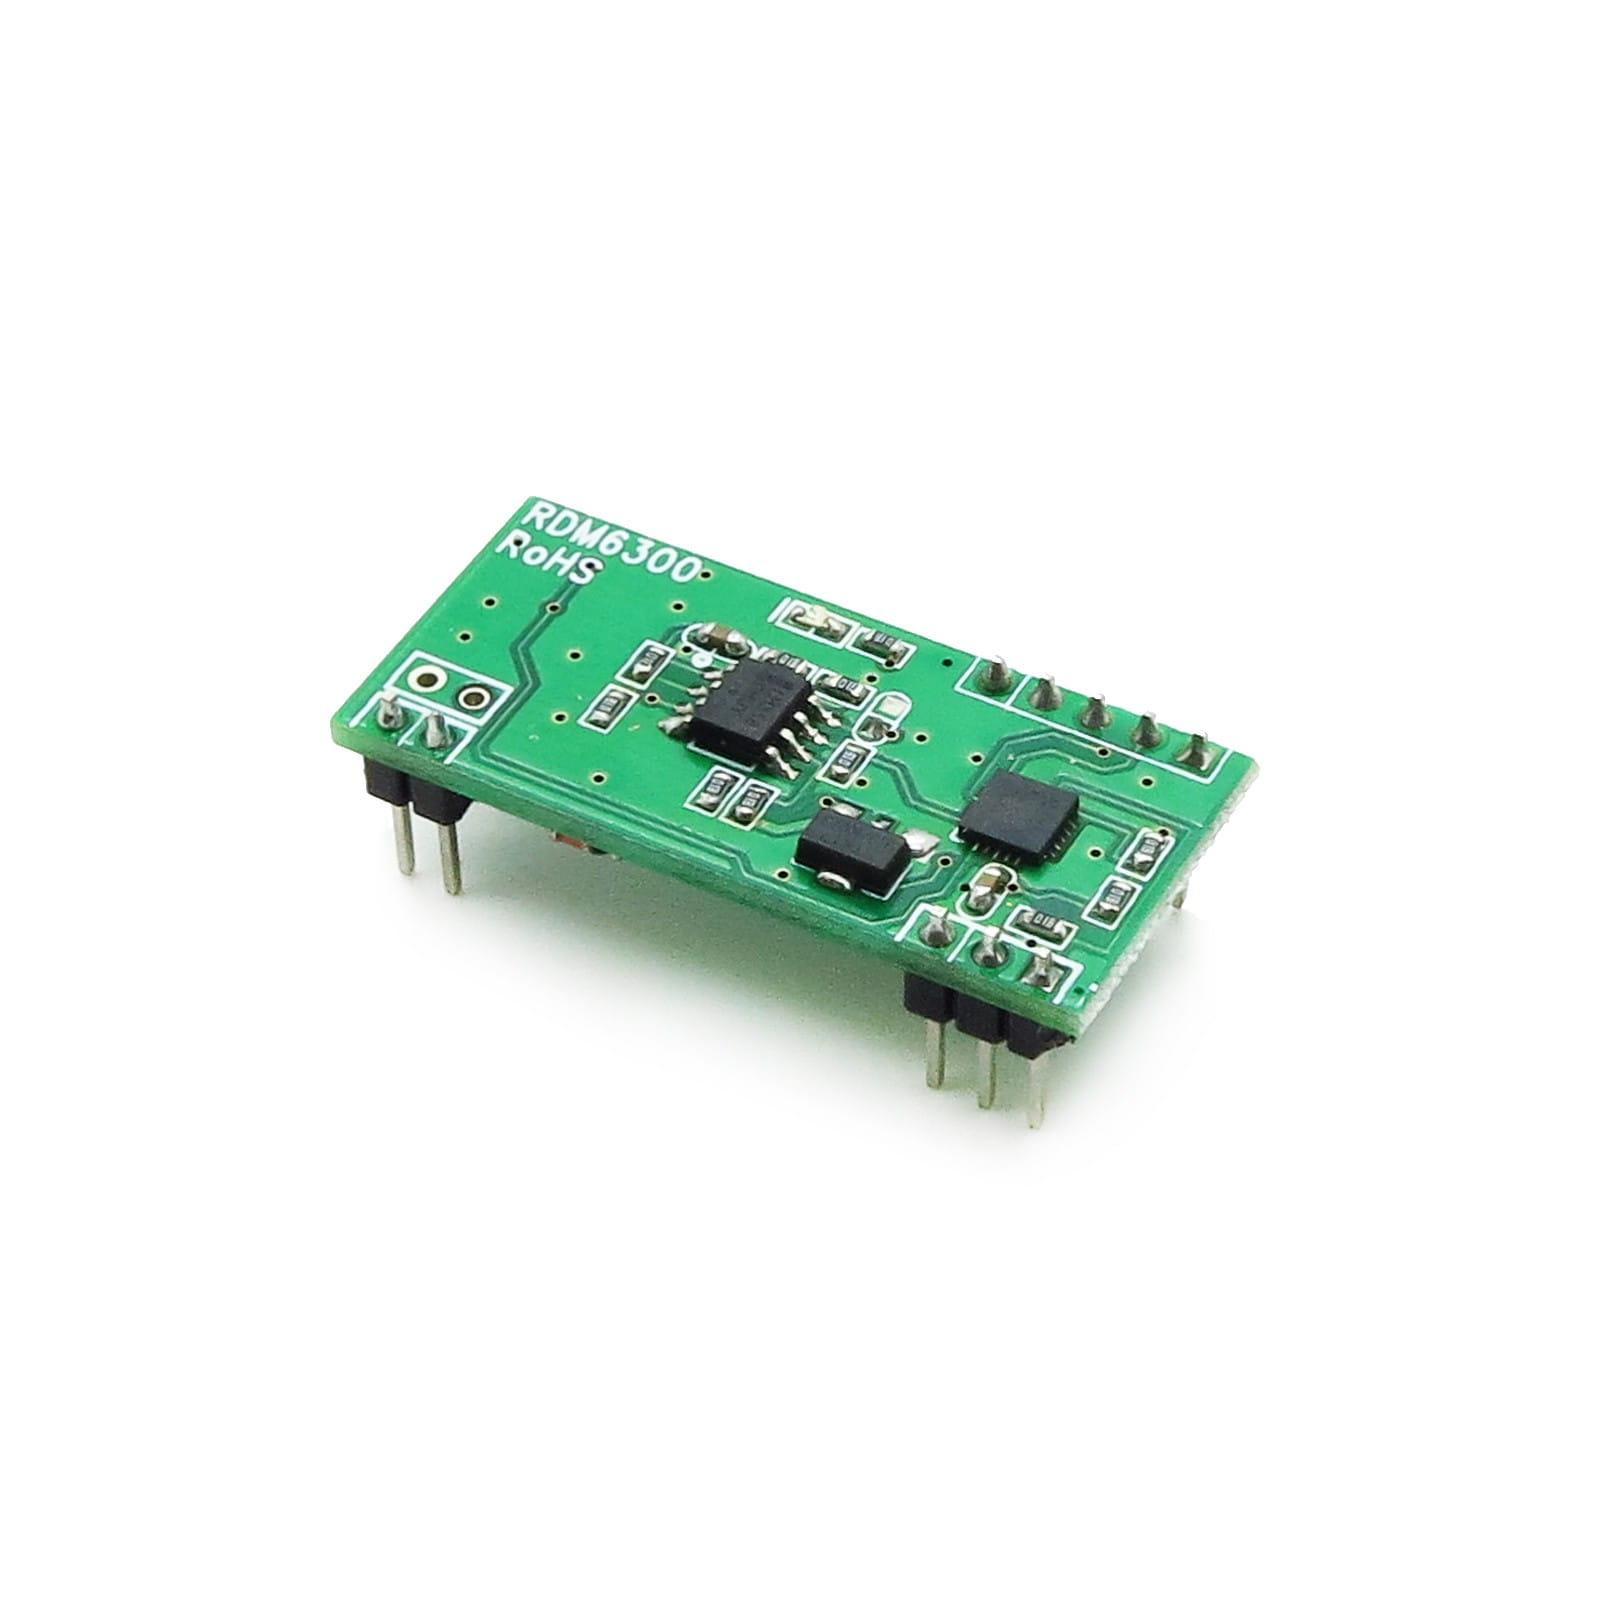 SIM Card Reader - Microcontroller Project Circuit